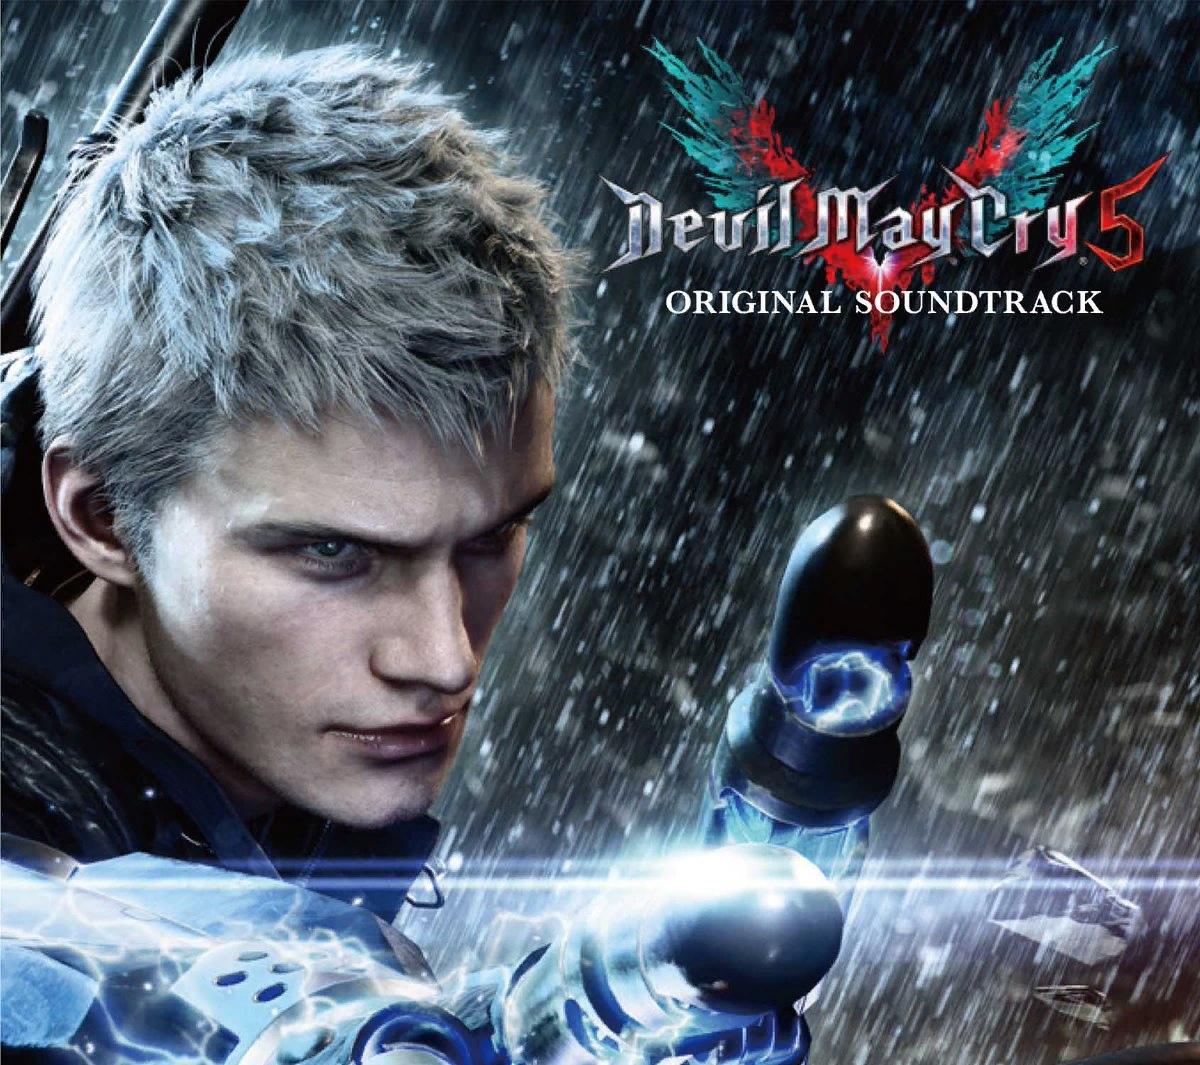 N_dOYauOjjk.jpg - Devil May Cry 5